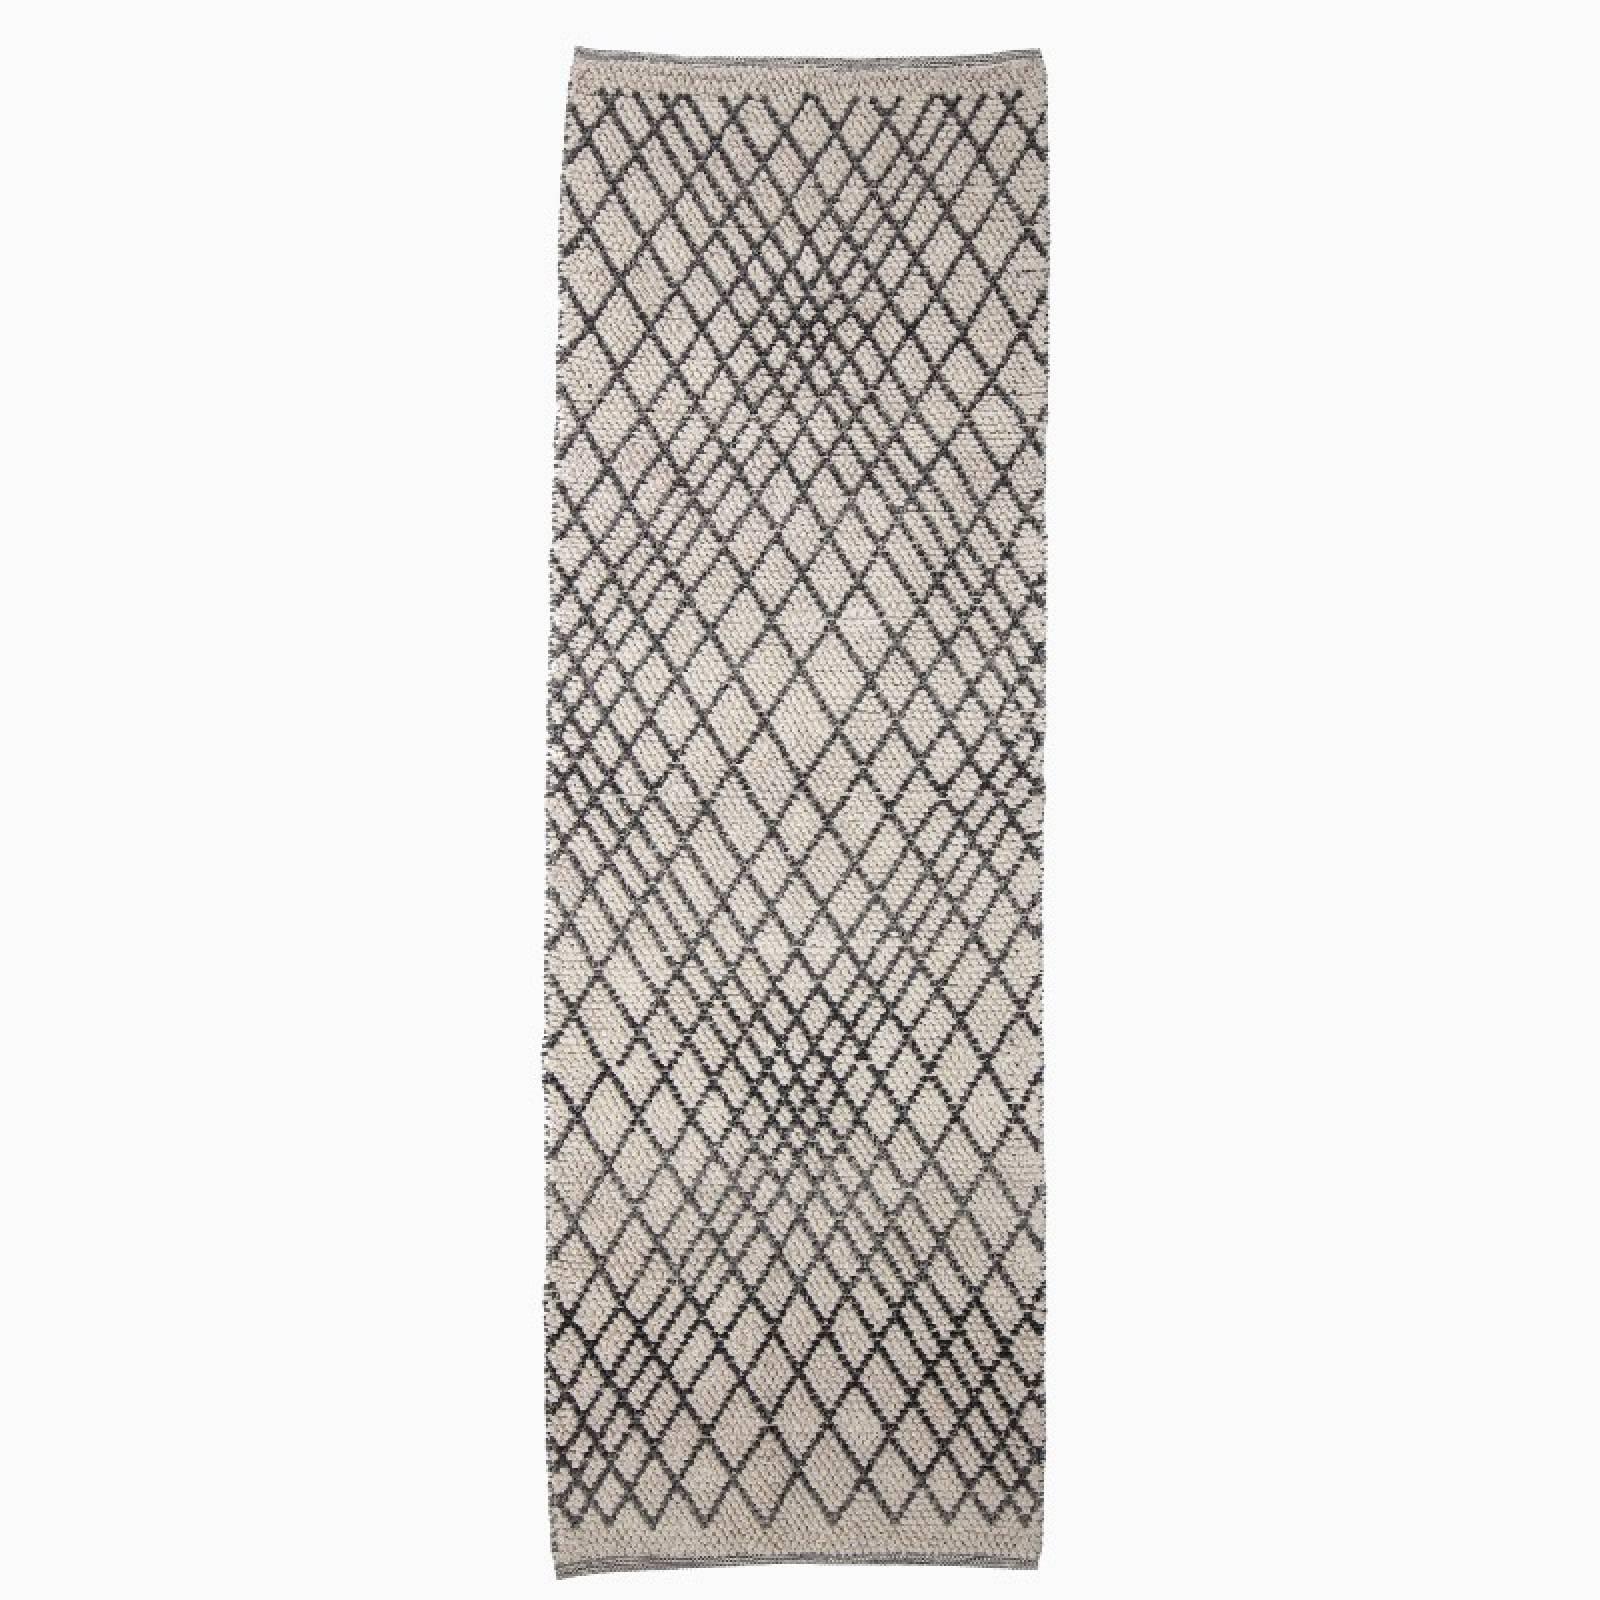 Linear Patterned Grey Runner Rug 250x80cm thumbnails